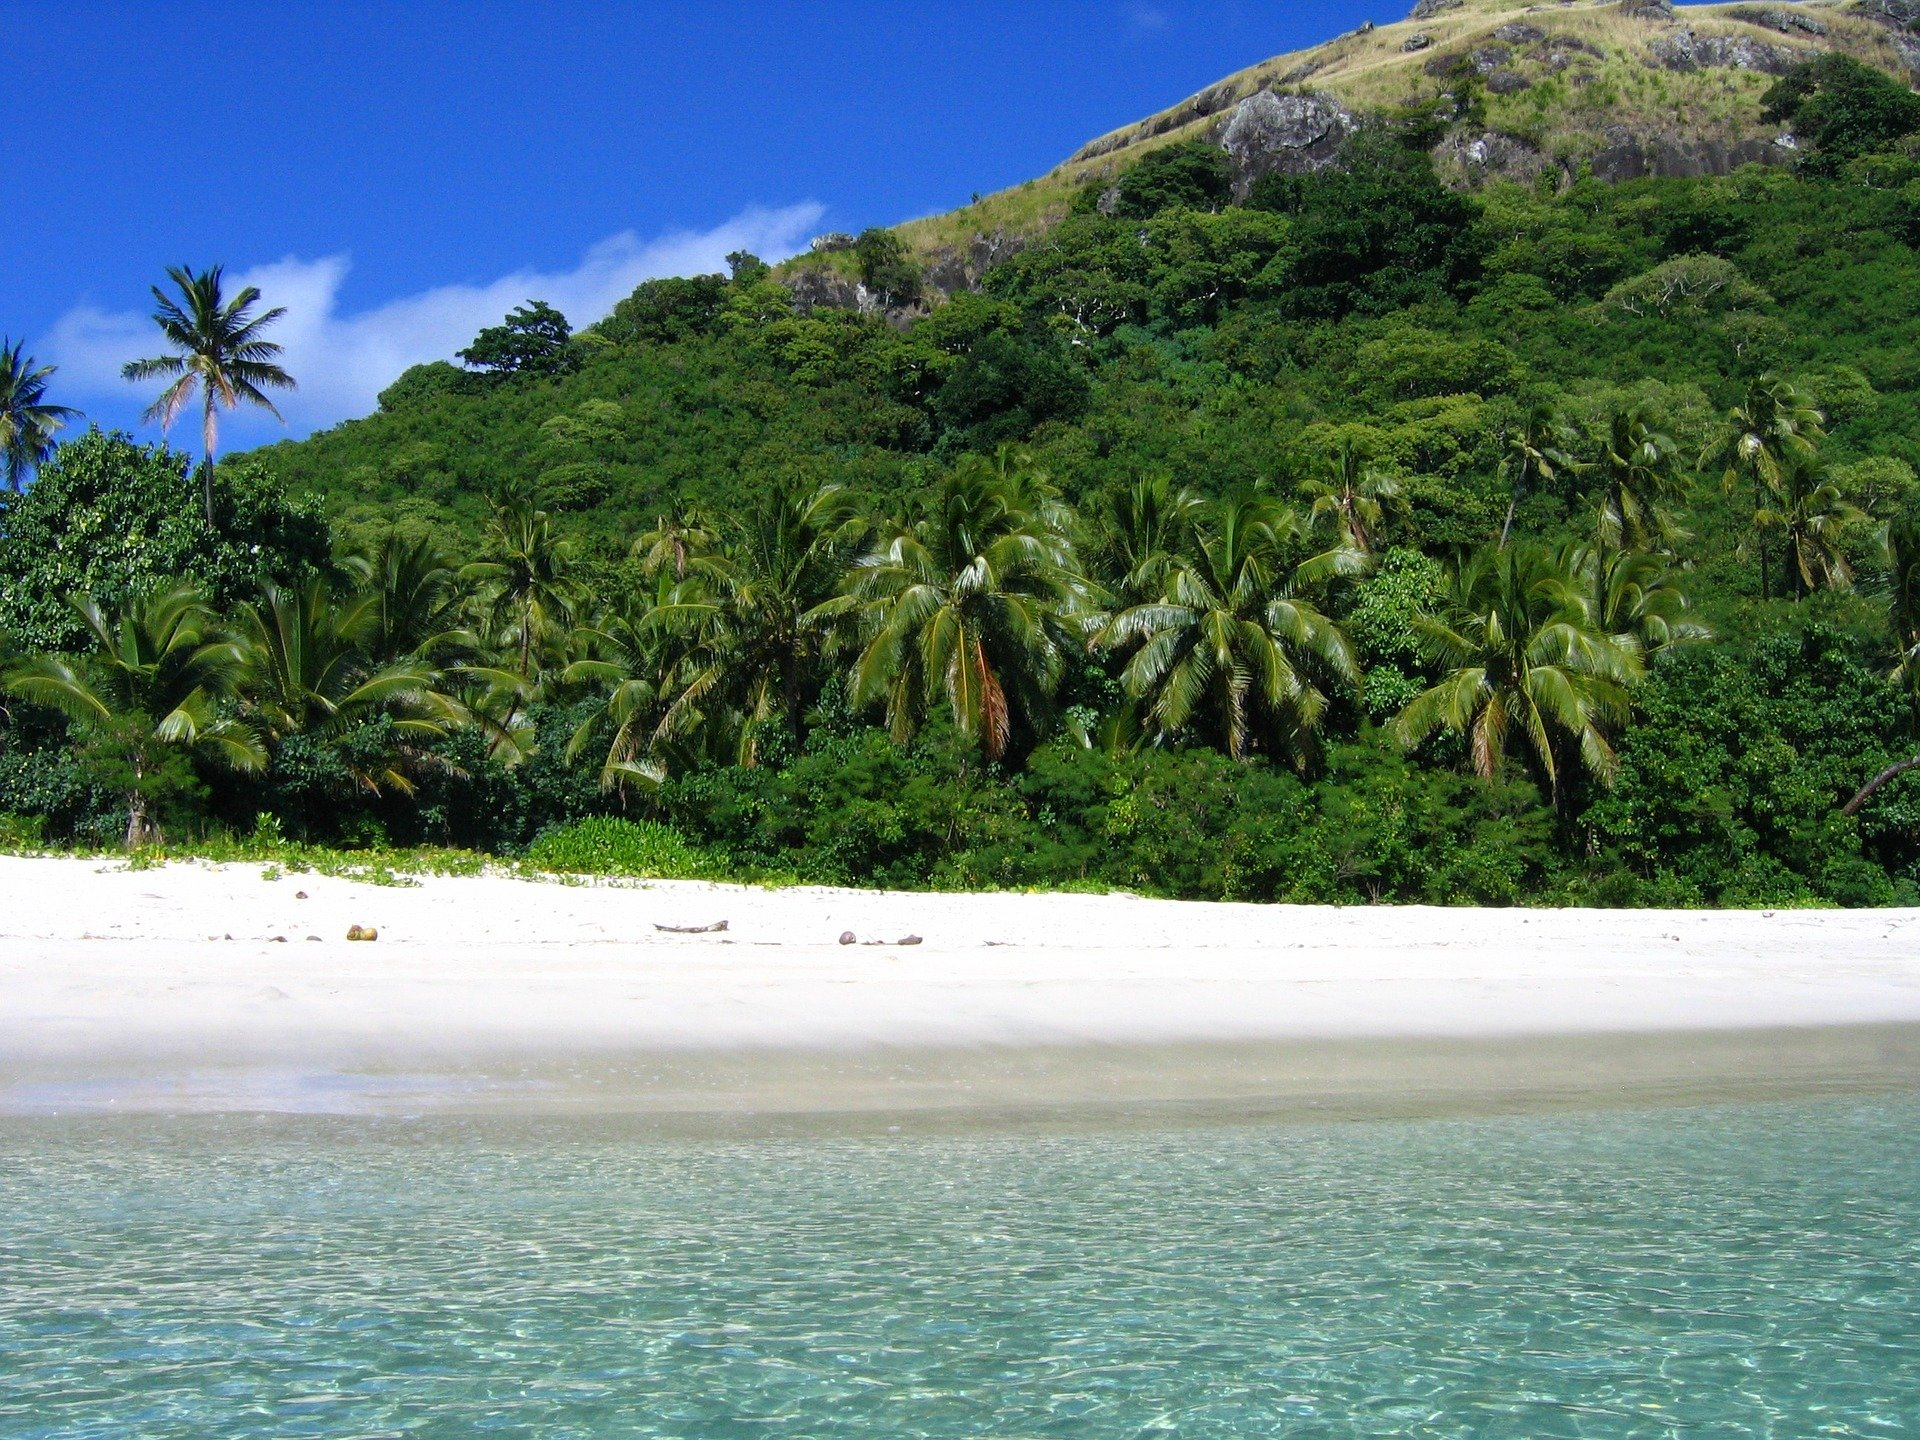 5-Day Fiji Surf Adventure on the Coral Coast - Fiji Itinerary